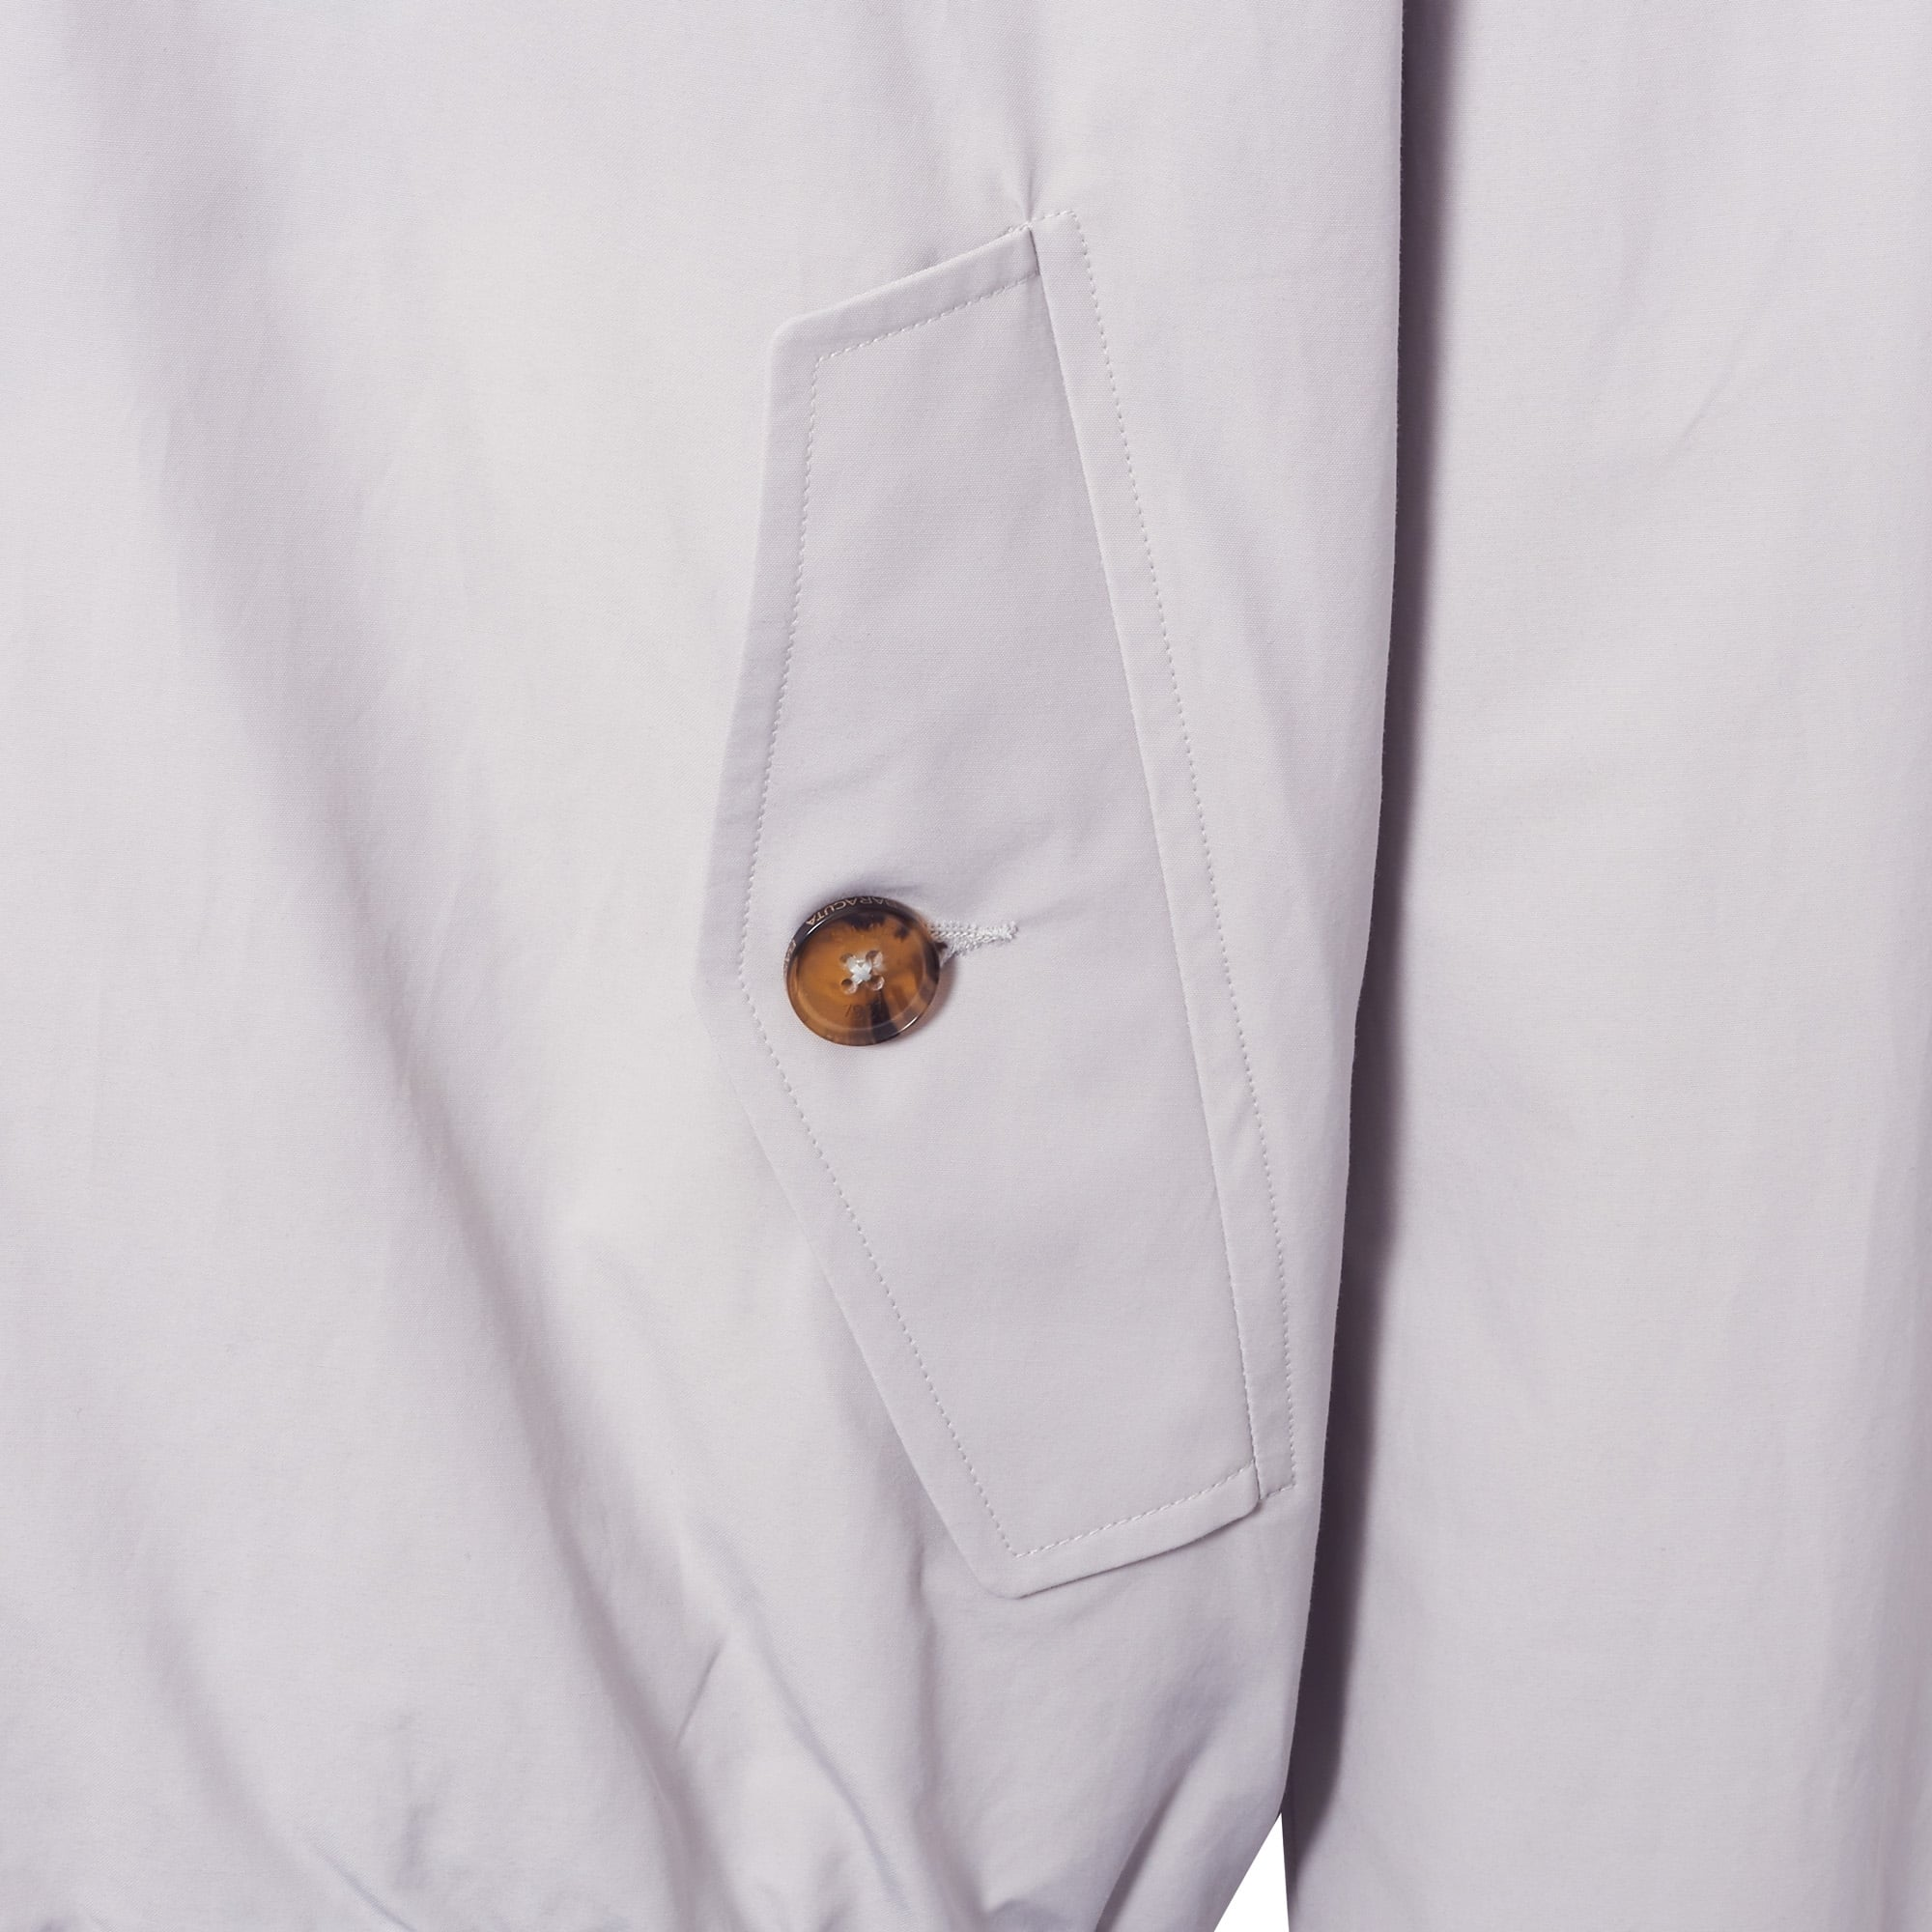 6e0058bb8136b Baracuta G9 Modern Classic Harrington Jacket - Mist